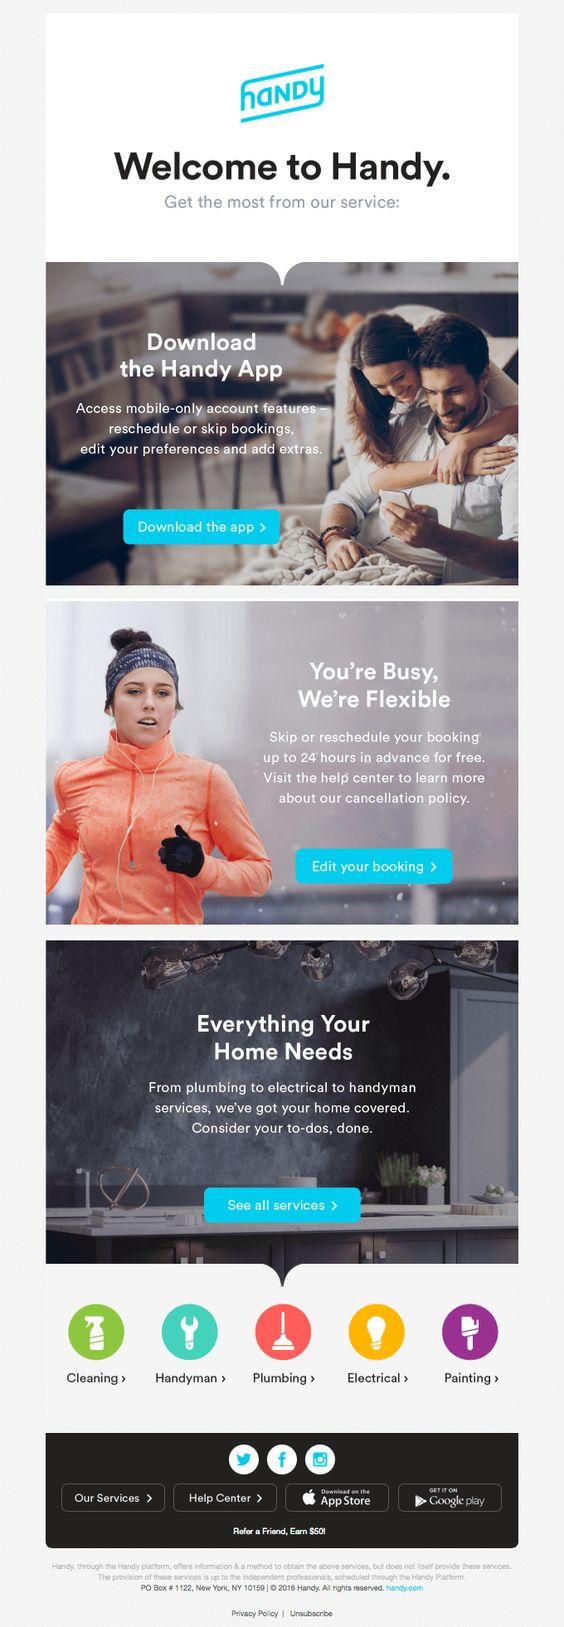 13 of the Best Examples of Beautiful Email Design http://blog.hubspot.com/blog/tabid/6307/bid/32984/Feast-Your-Eyes-on-These-9-Examples-of-Beautiful-Email-Marketing.aspx via @hubspot